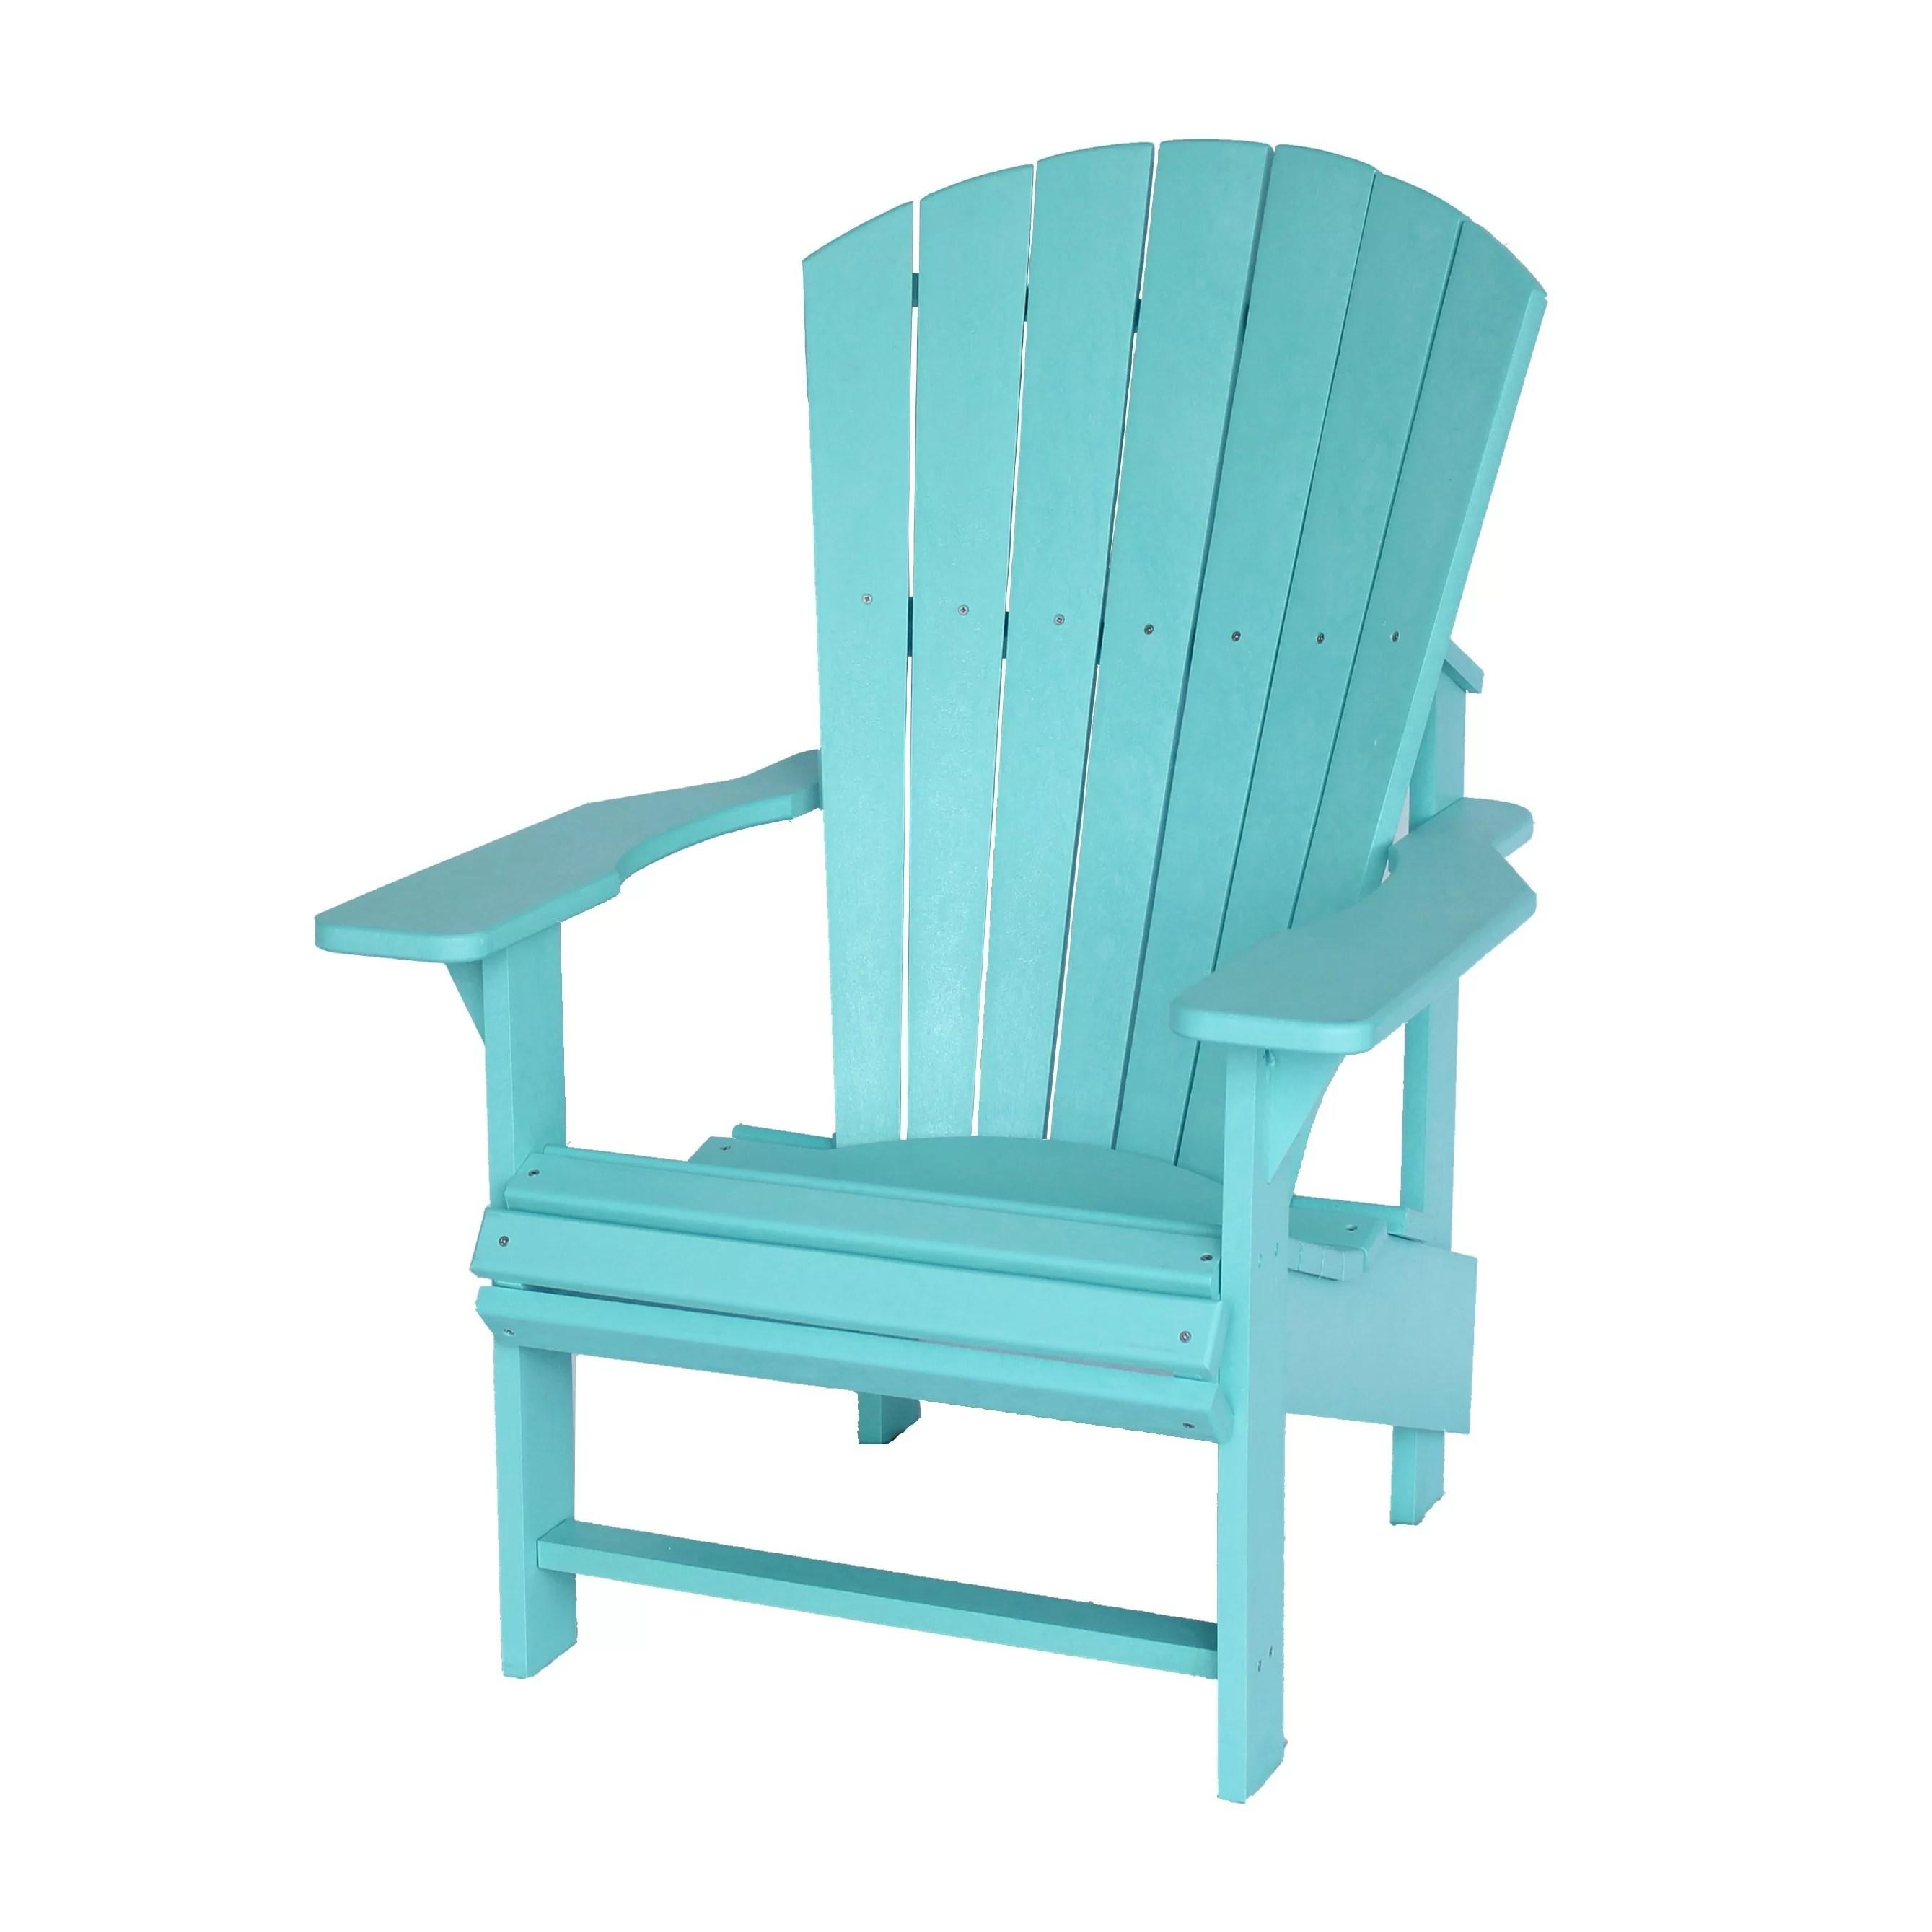 upright recliner chairs fishing chair umbrella clamp bay isle home trinidad adirondack and reviews